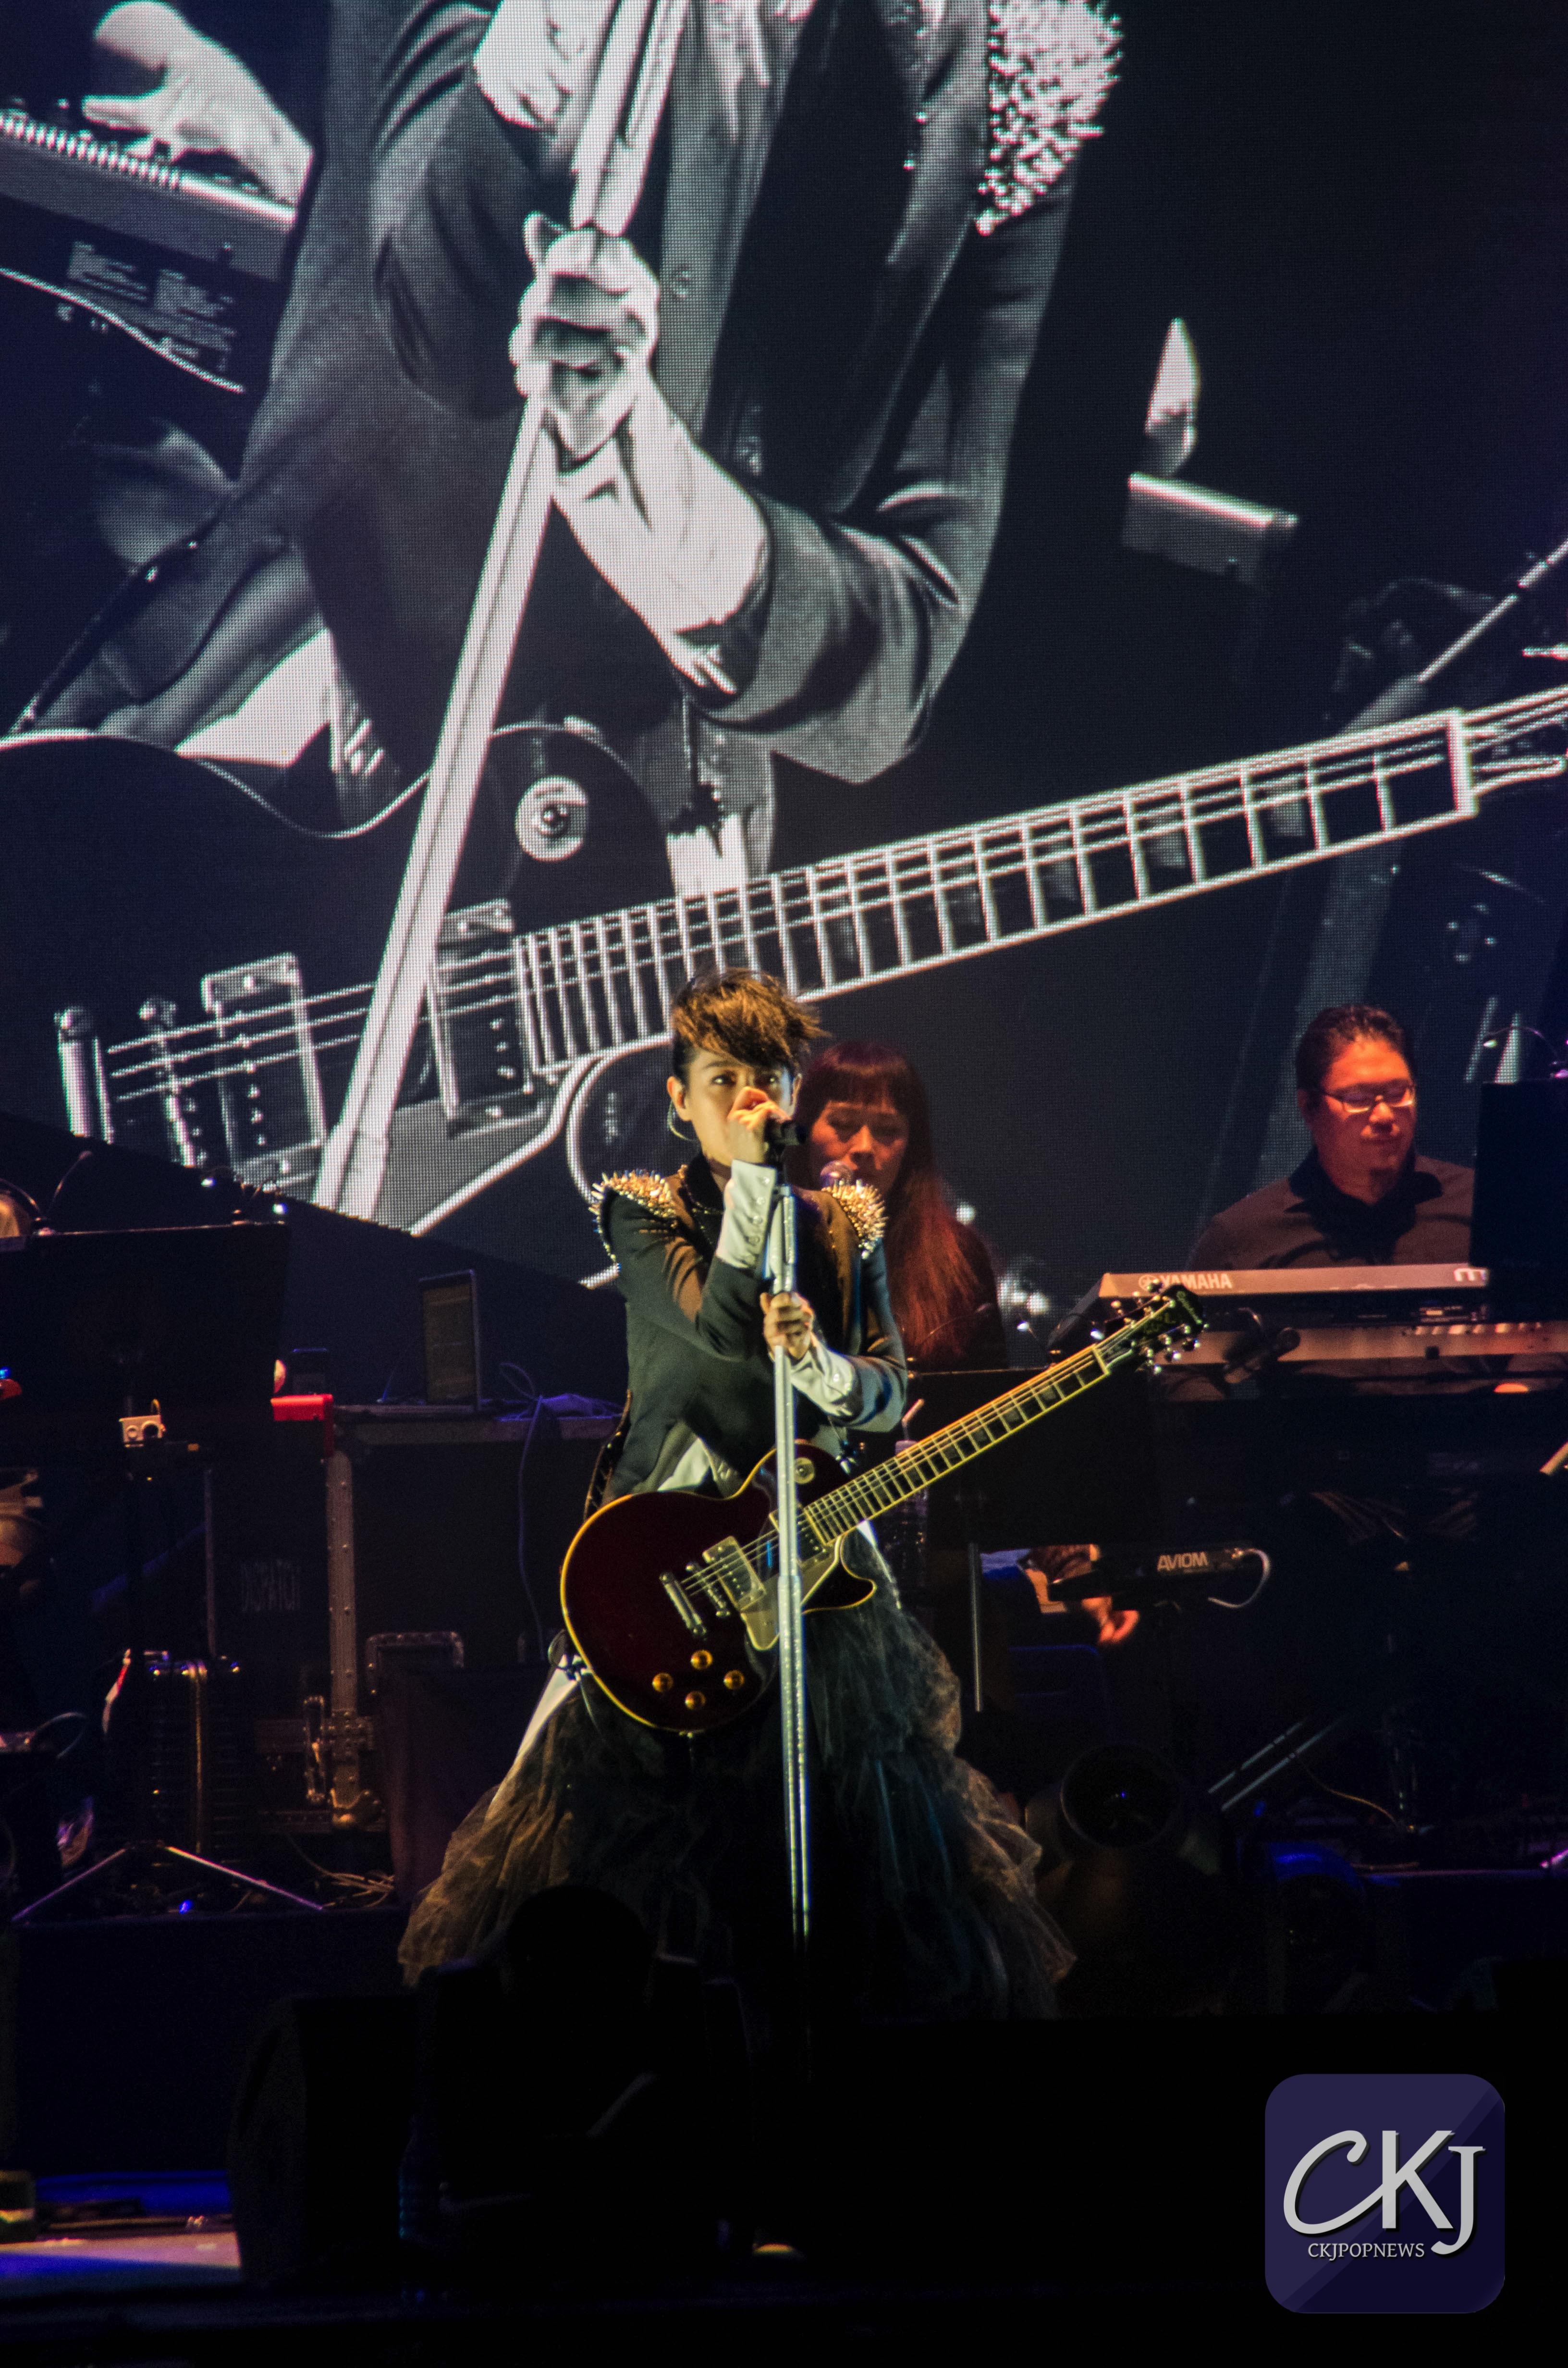 rené-liu_concert_casino-de-paris_28112016_groupal_01P2878